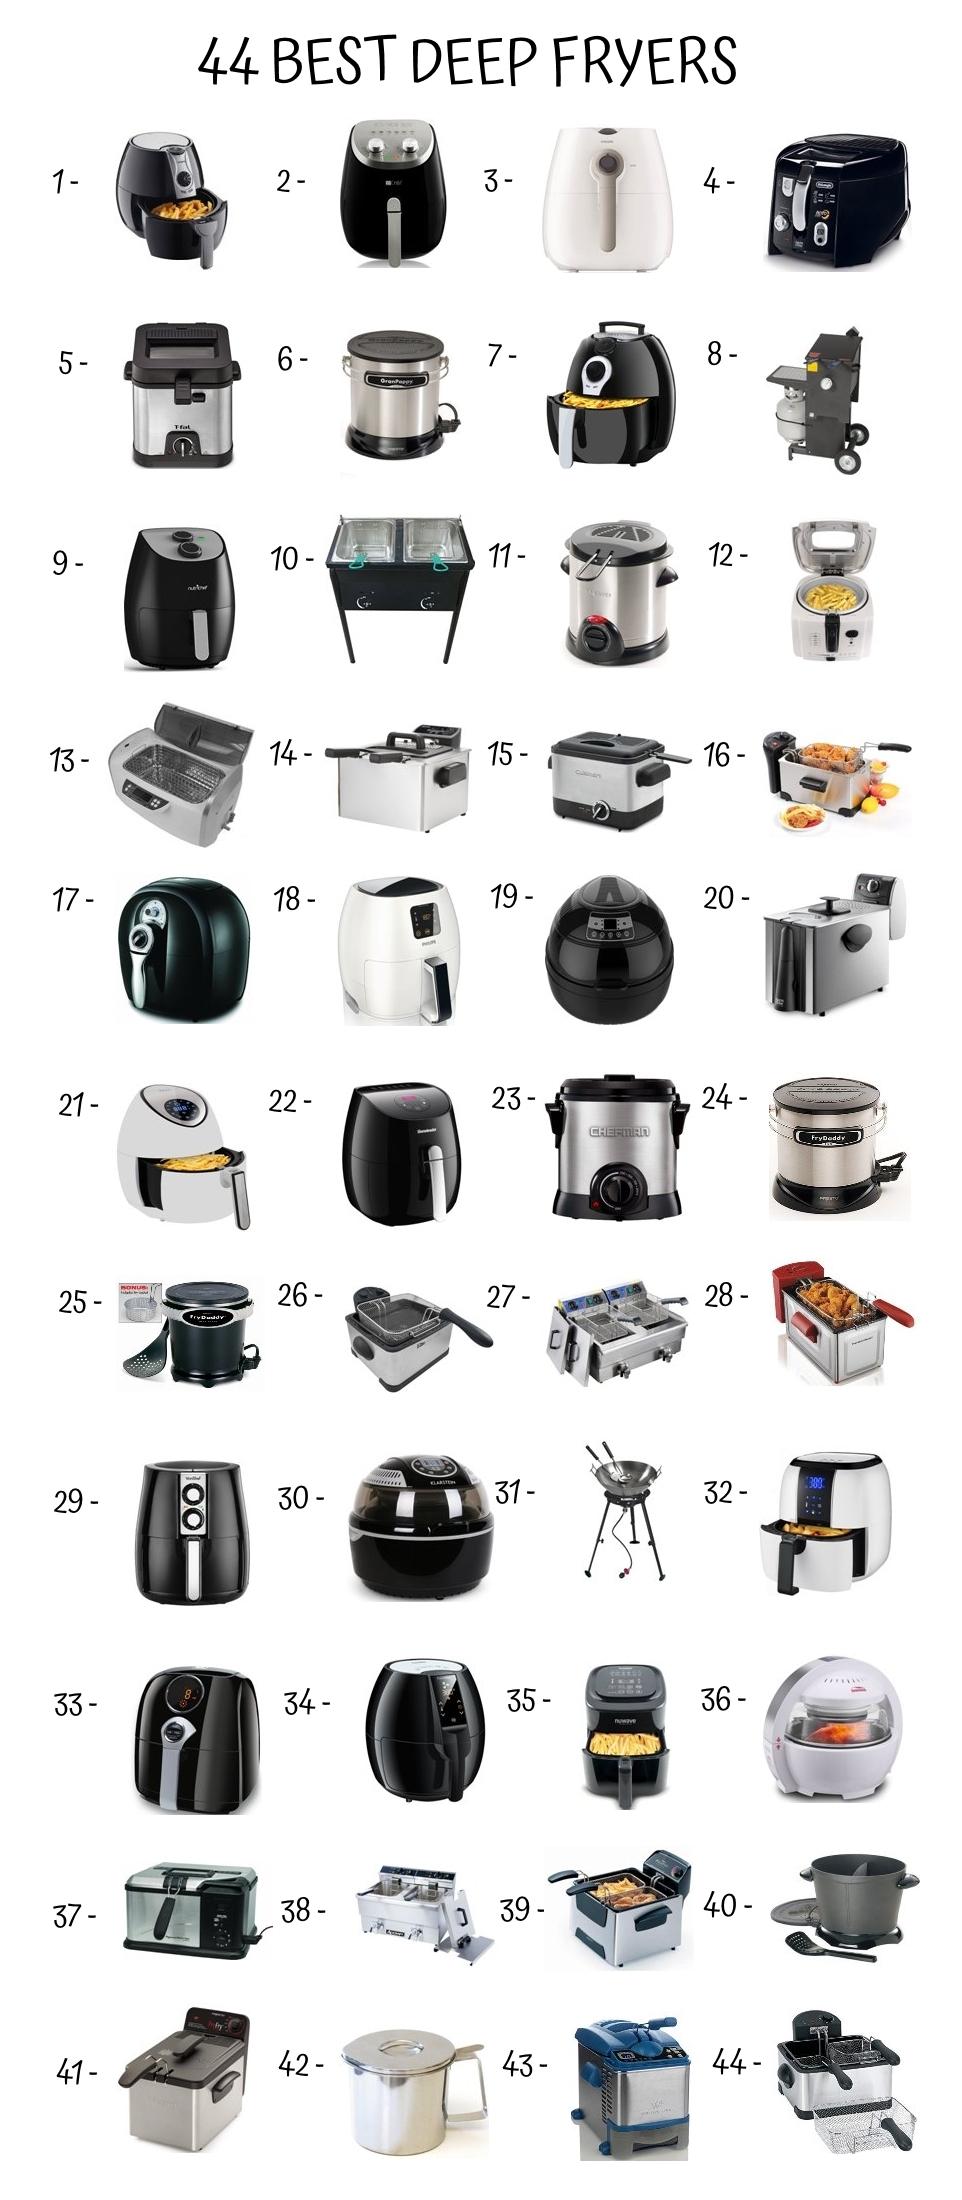 44 Best Deep Fryers